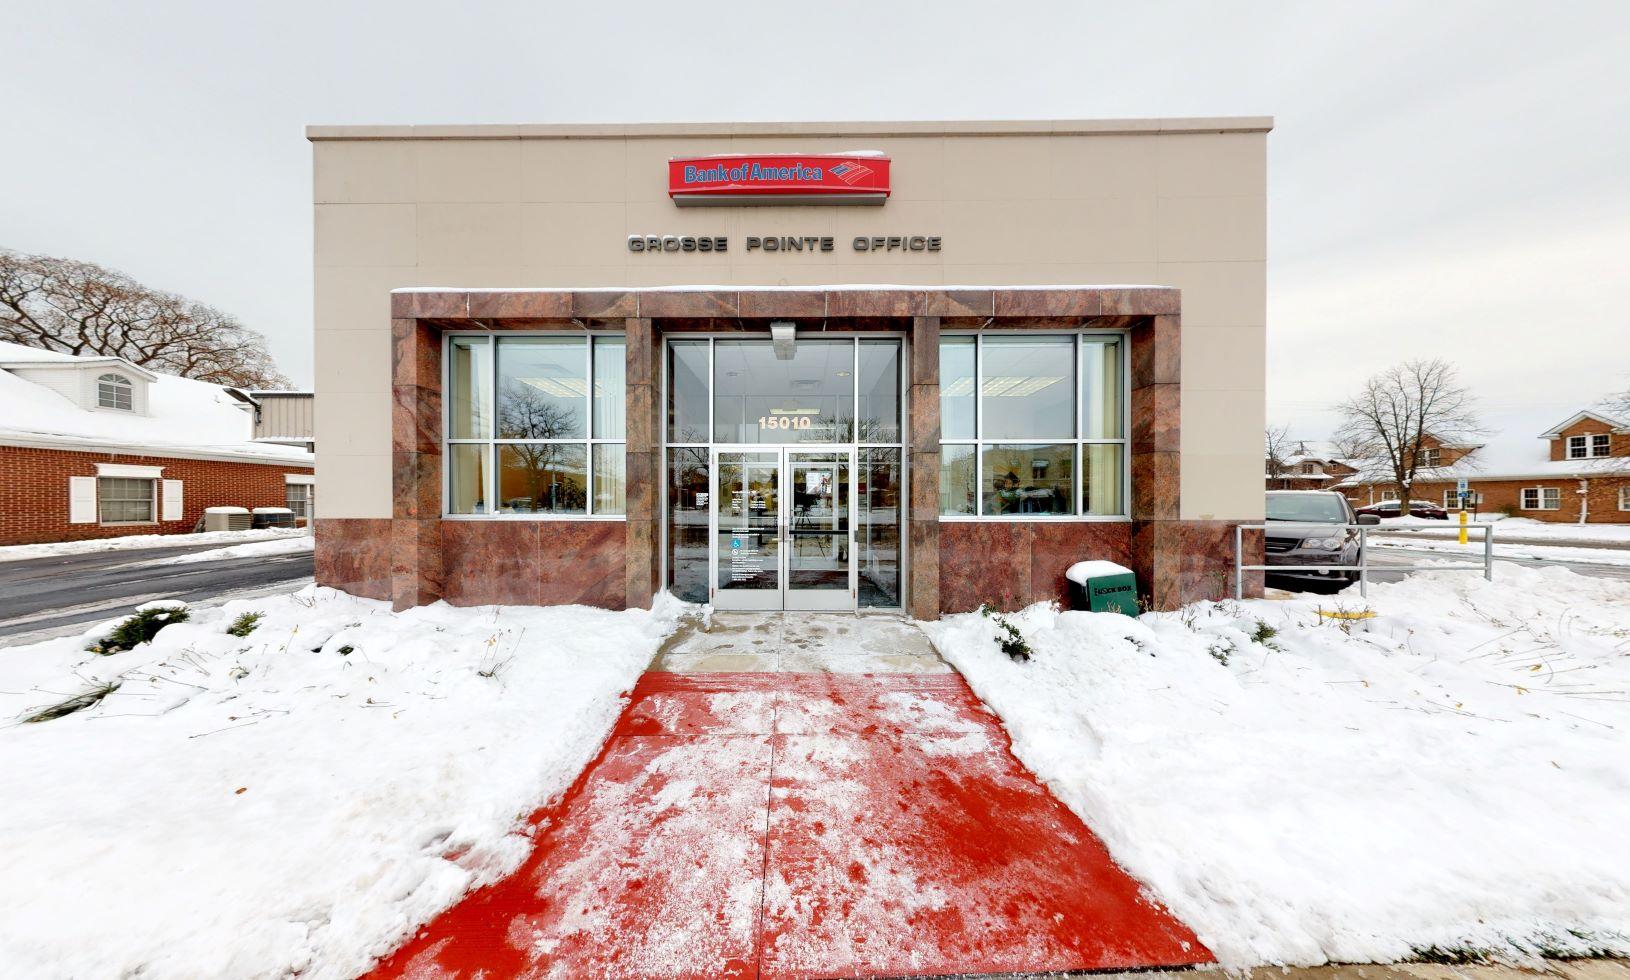 Bank of America financial center with drive-thru ATM | 15010 E Jefferson Ave, Grosse Pointe Park, MI 48230